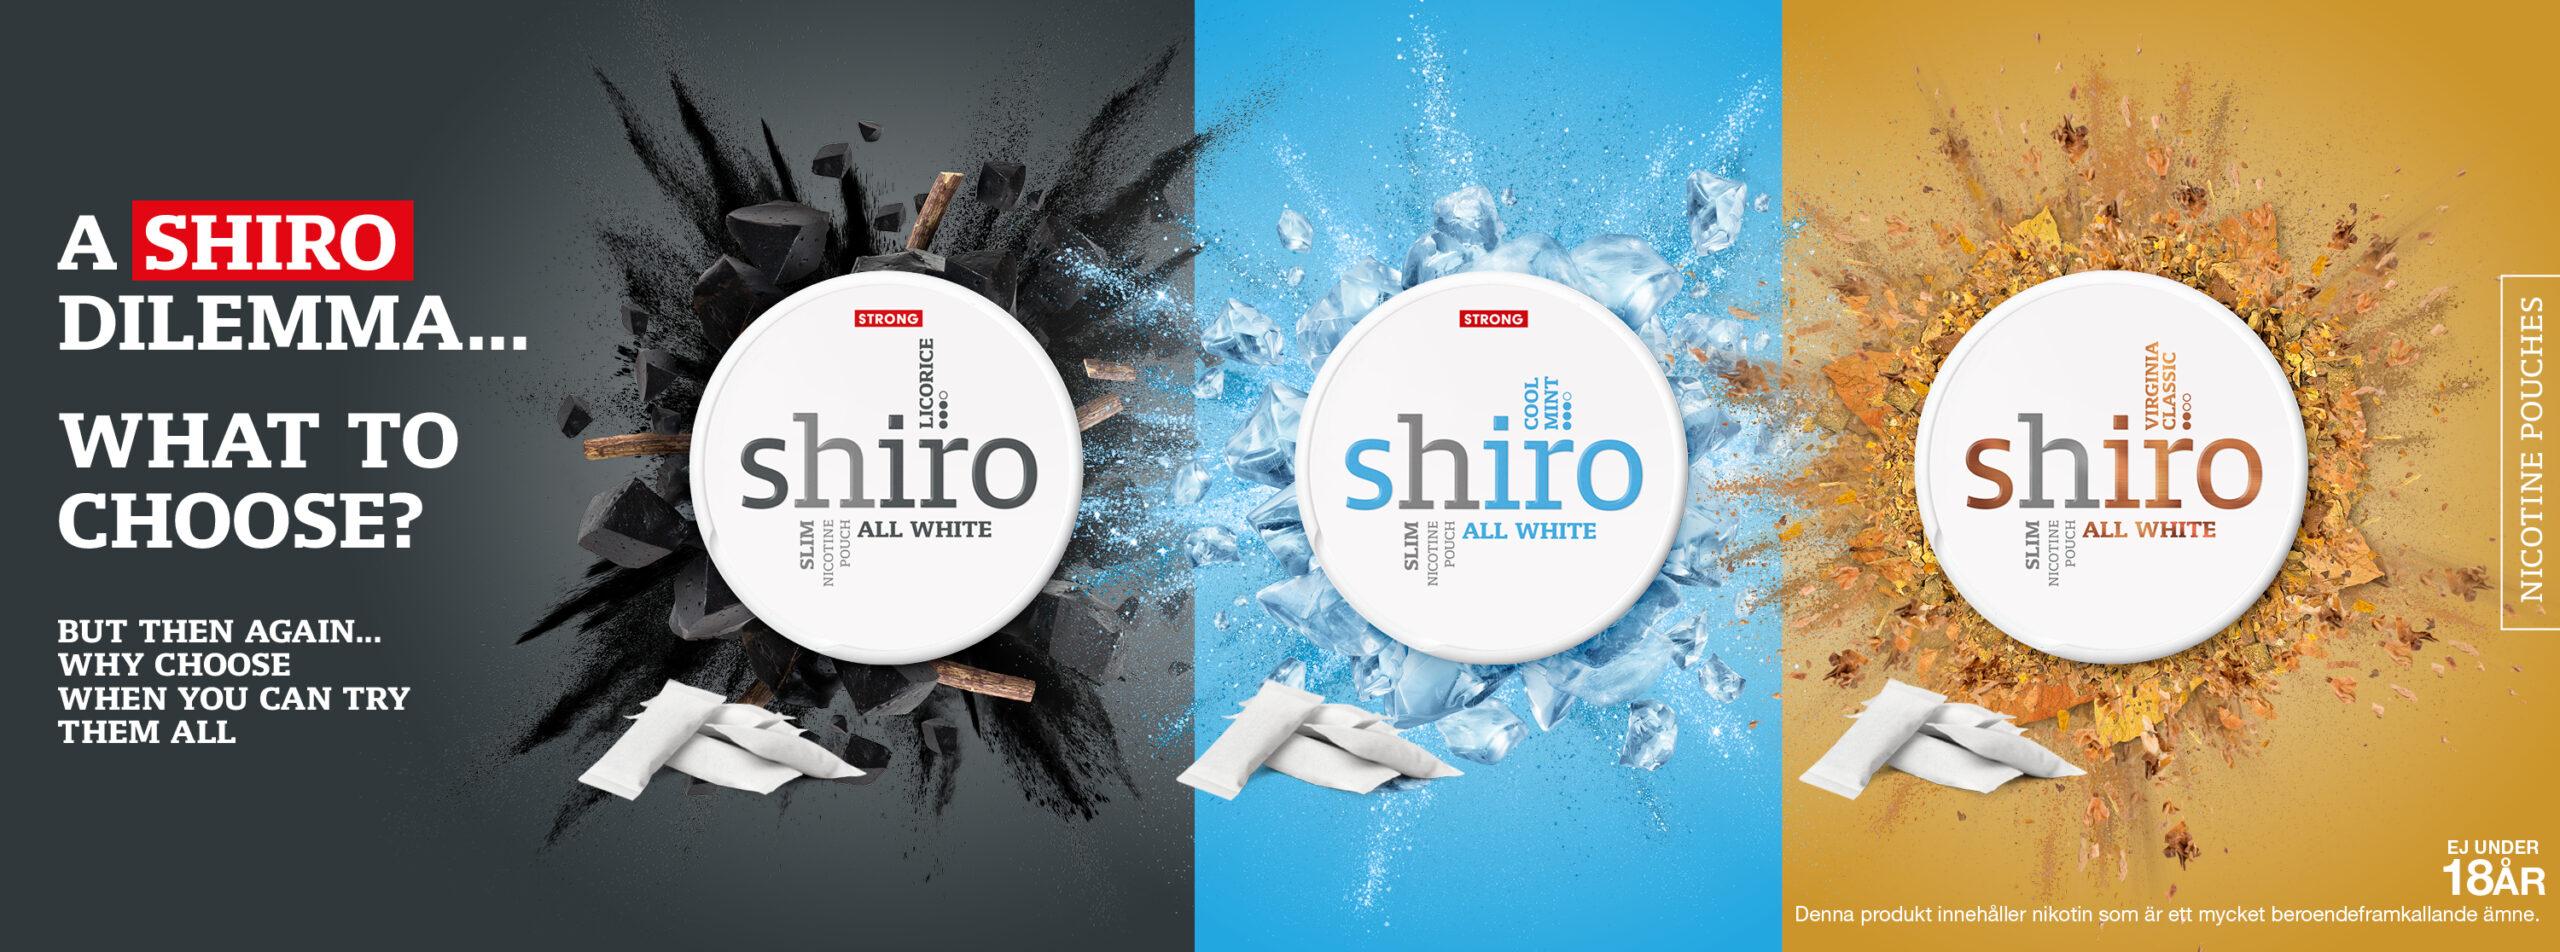 shiro all white snus banner